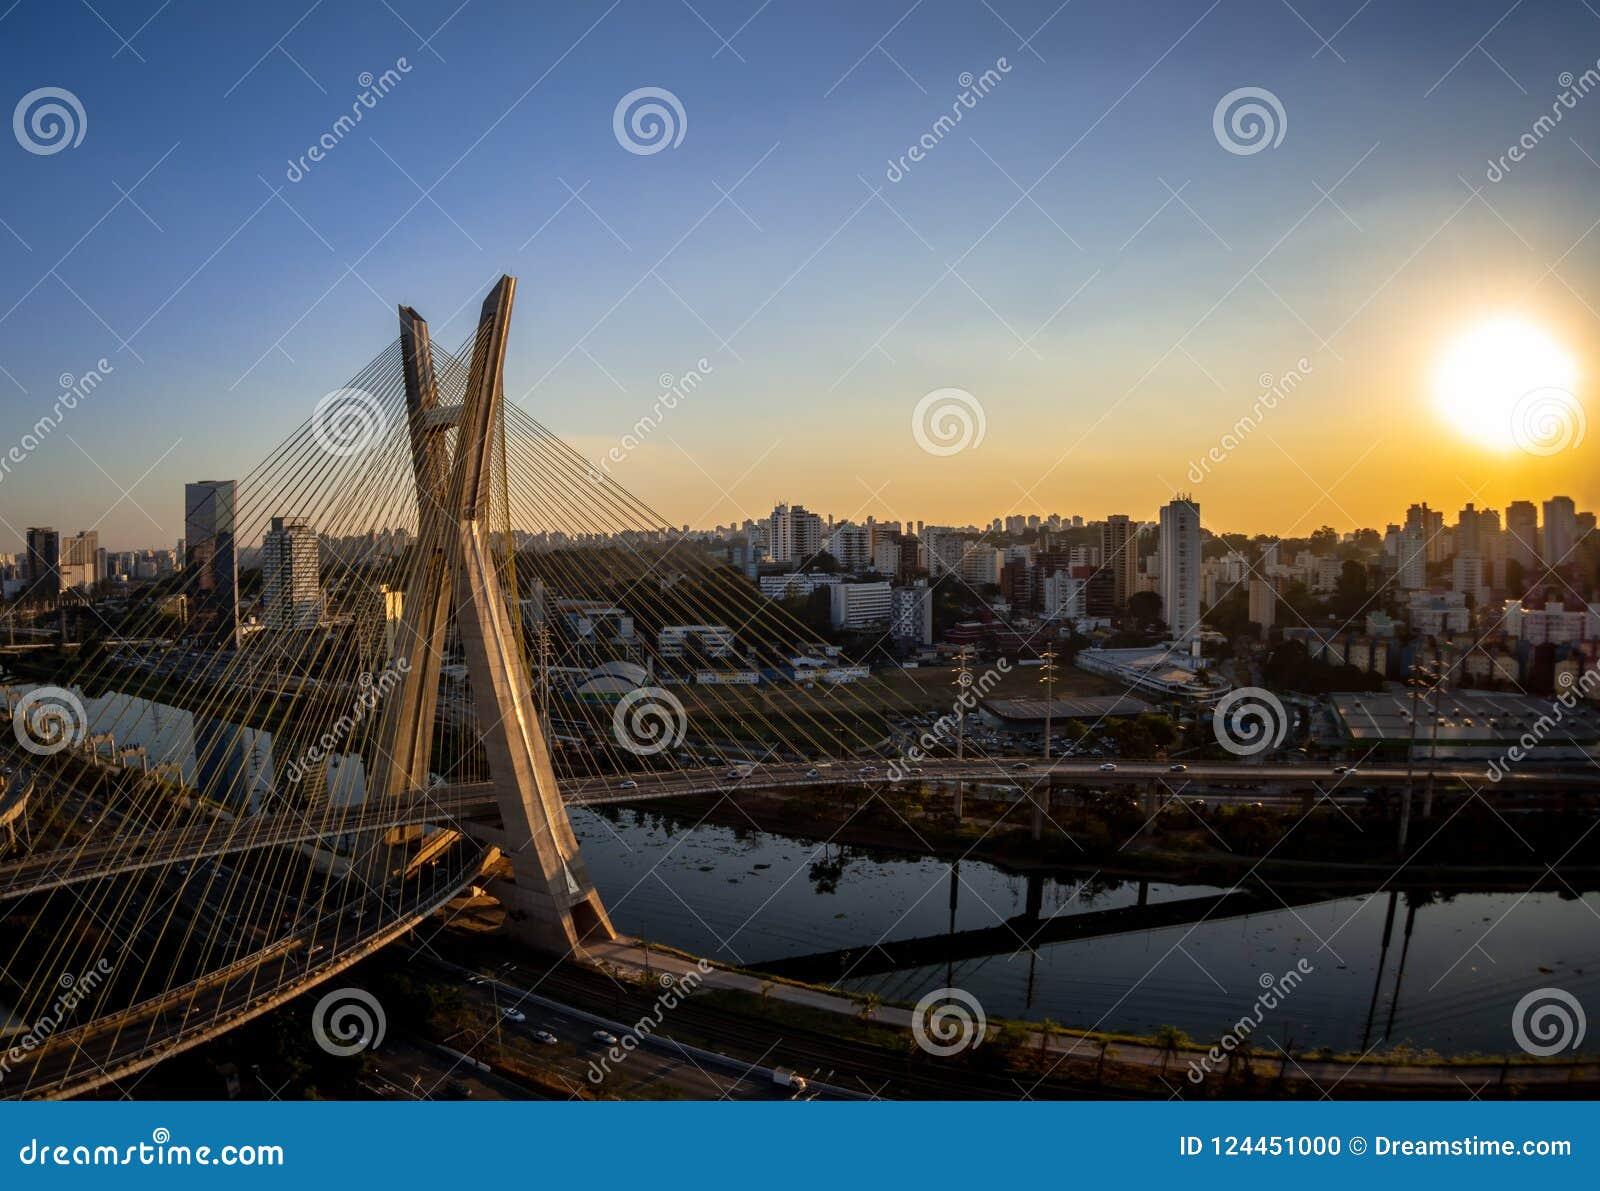 PINHEIROS RIVER SAO PAULO BRAZIL